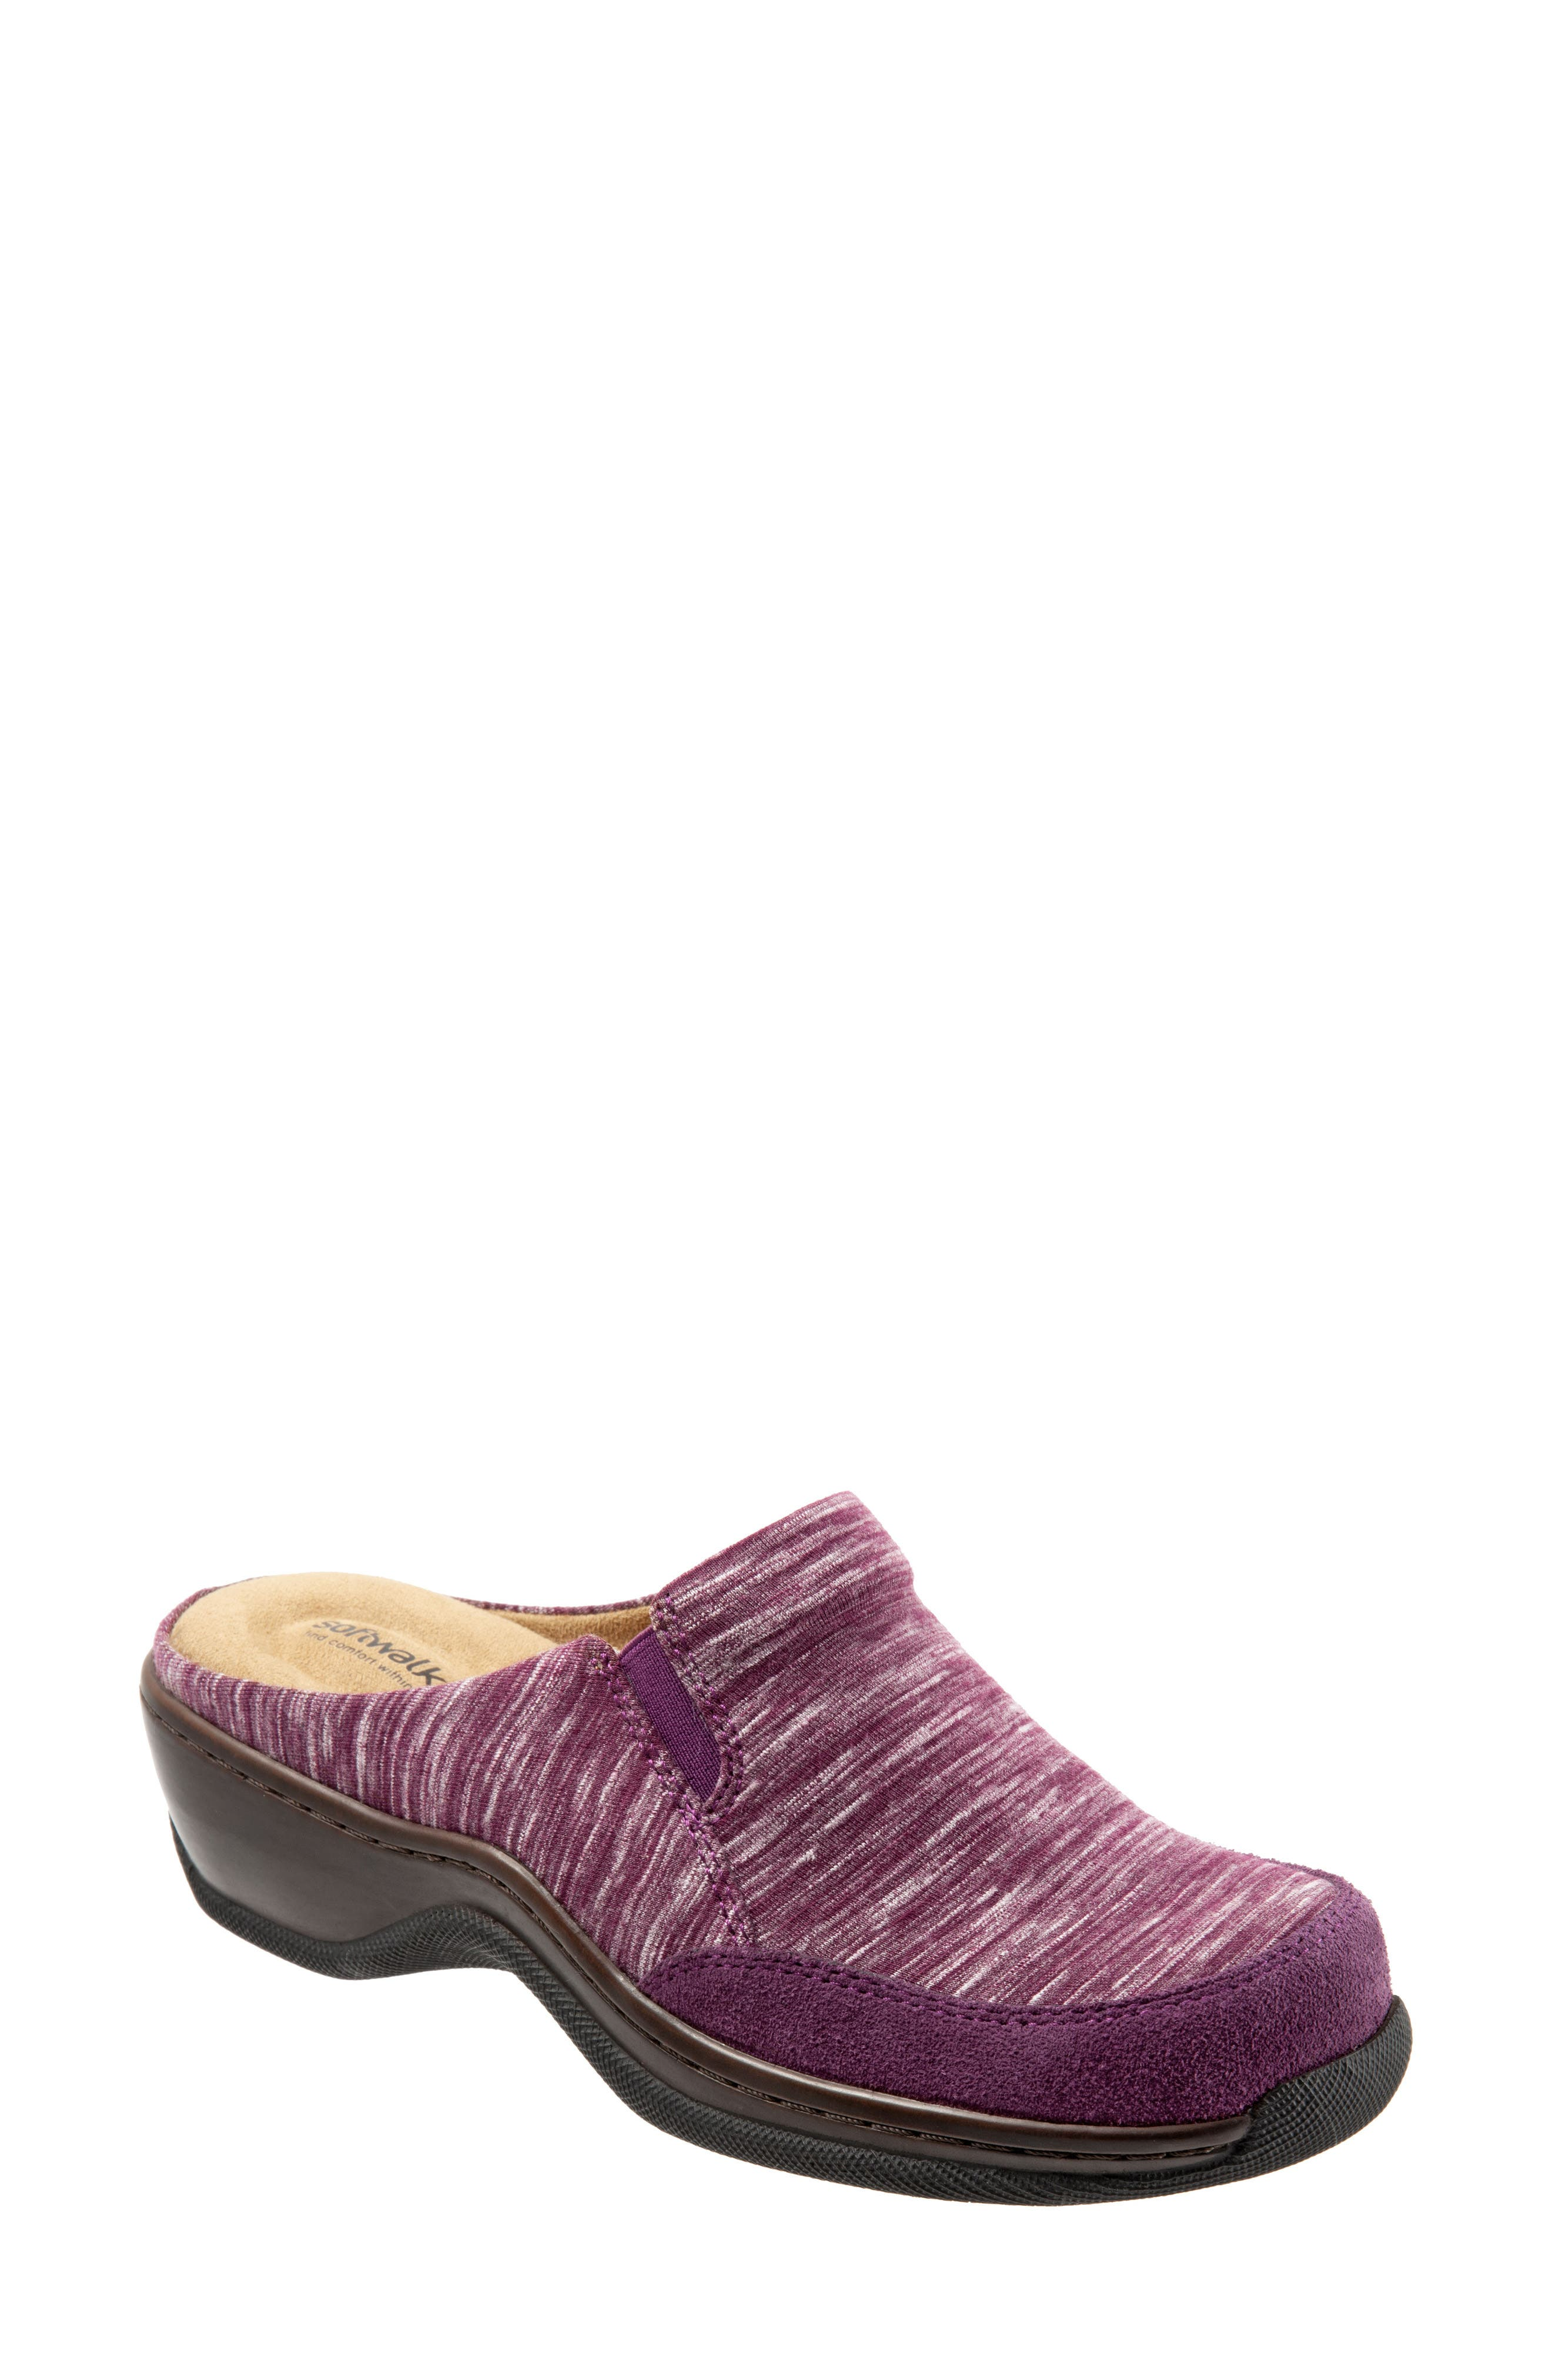 Alcon Clog,                         Main,                         color, Burgundy Multi Fabric